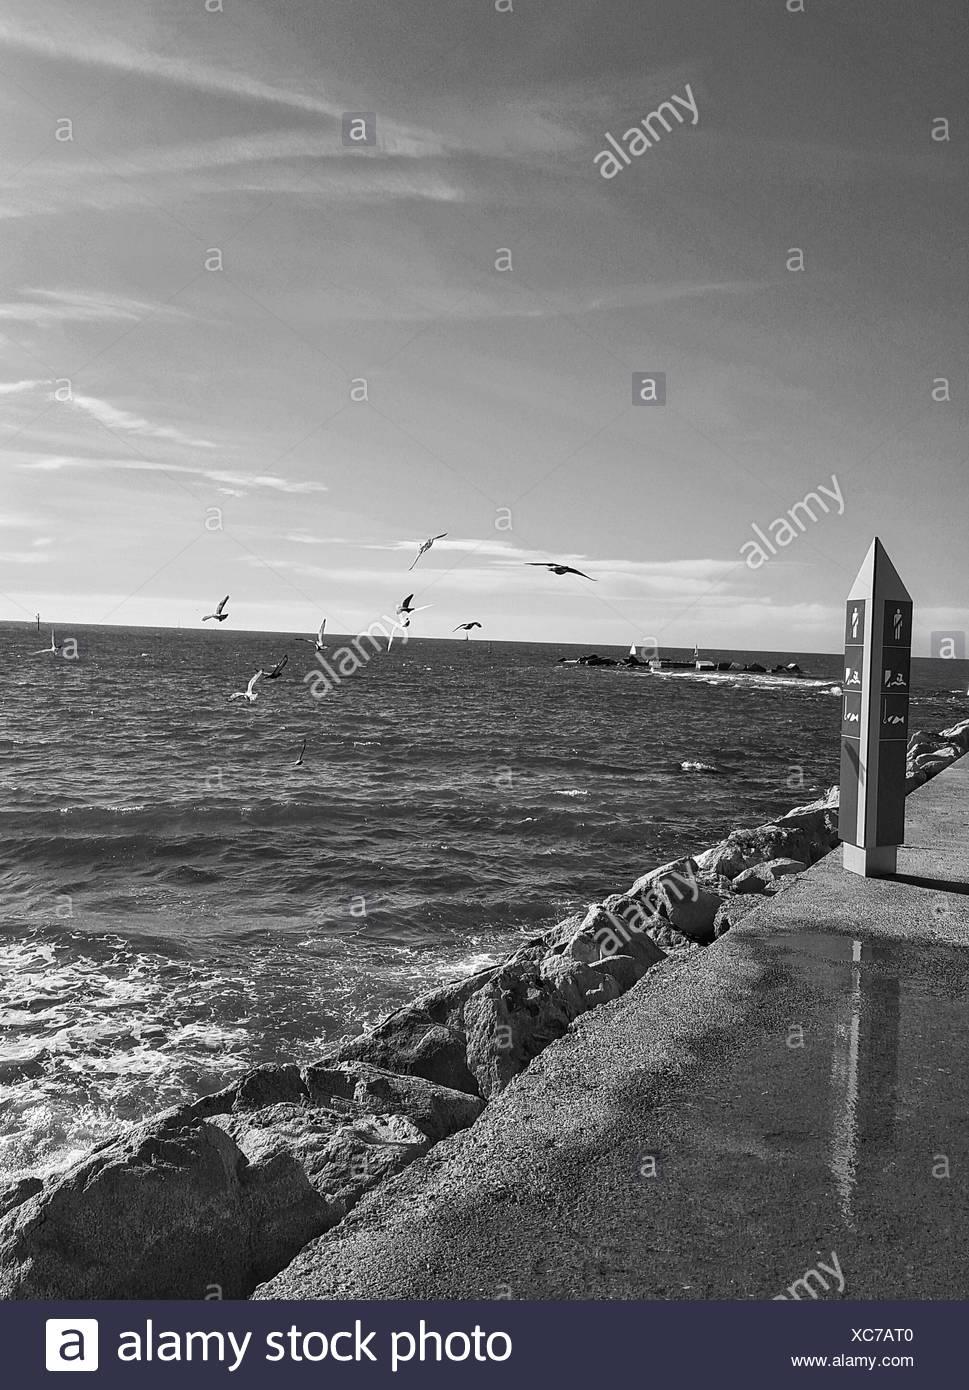 Flock Of Birds Flying Over Sea Against Sky Stock Photo